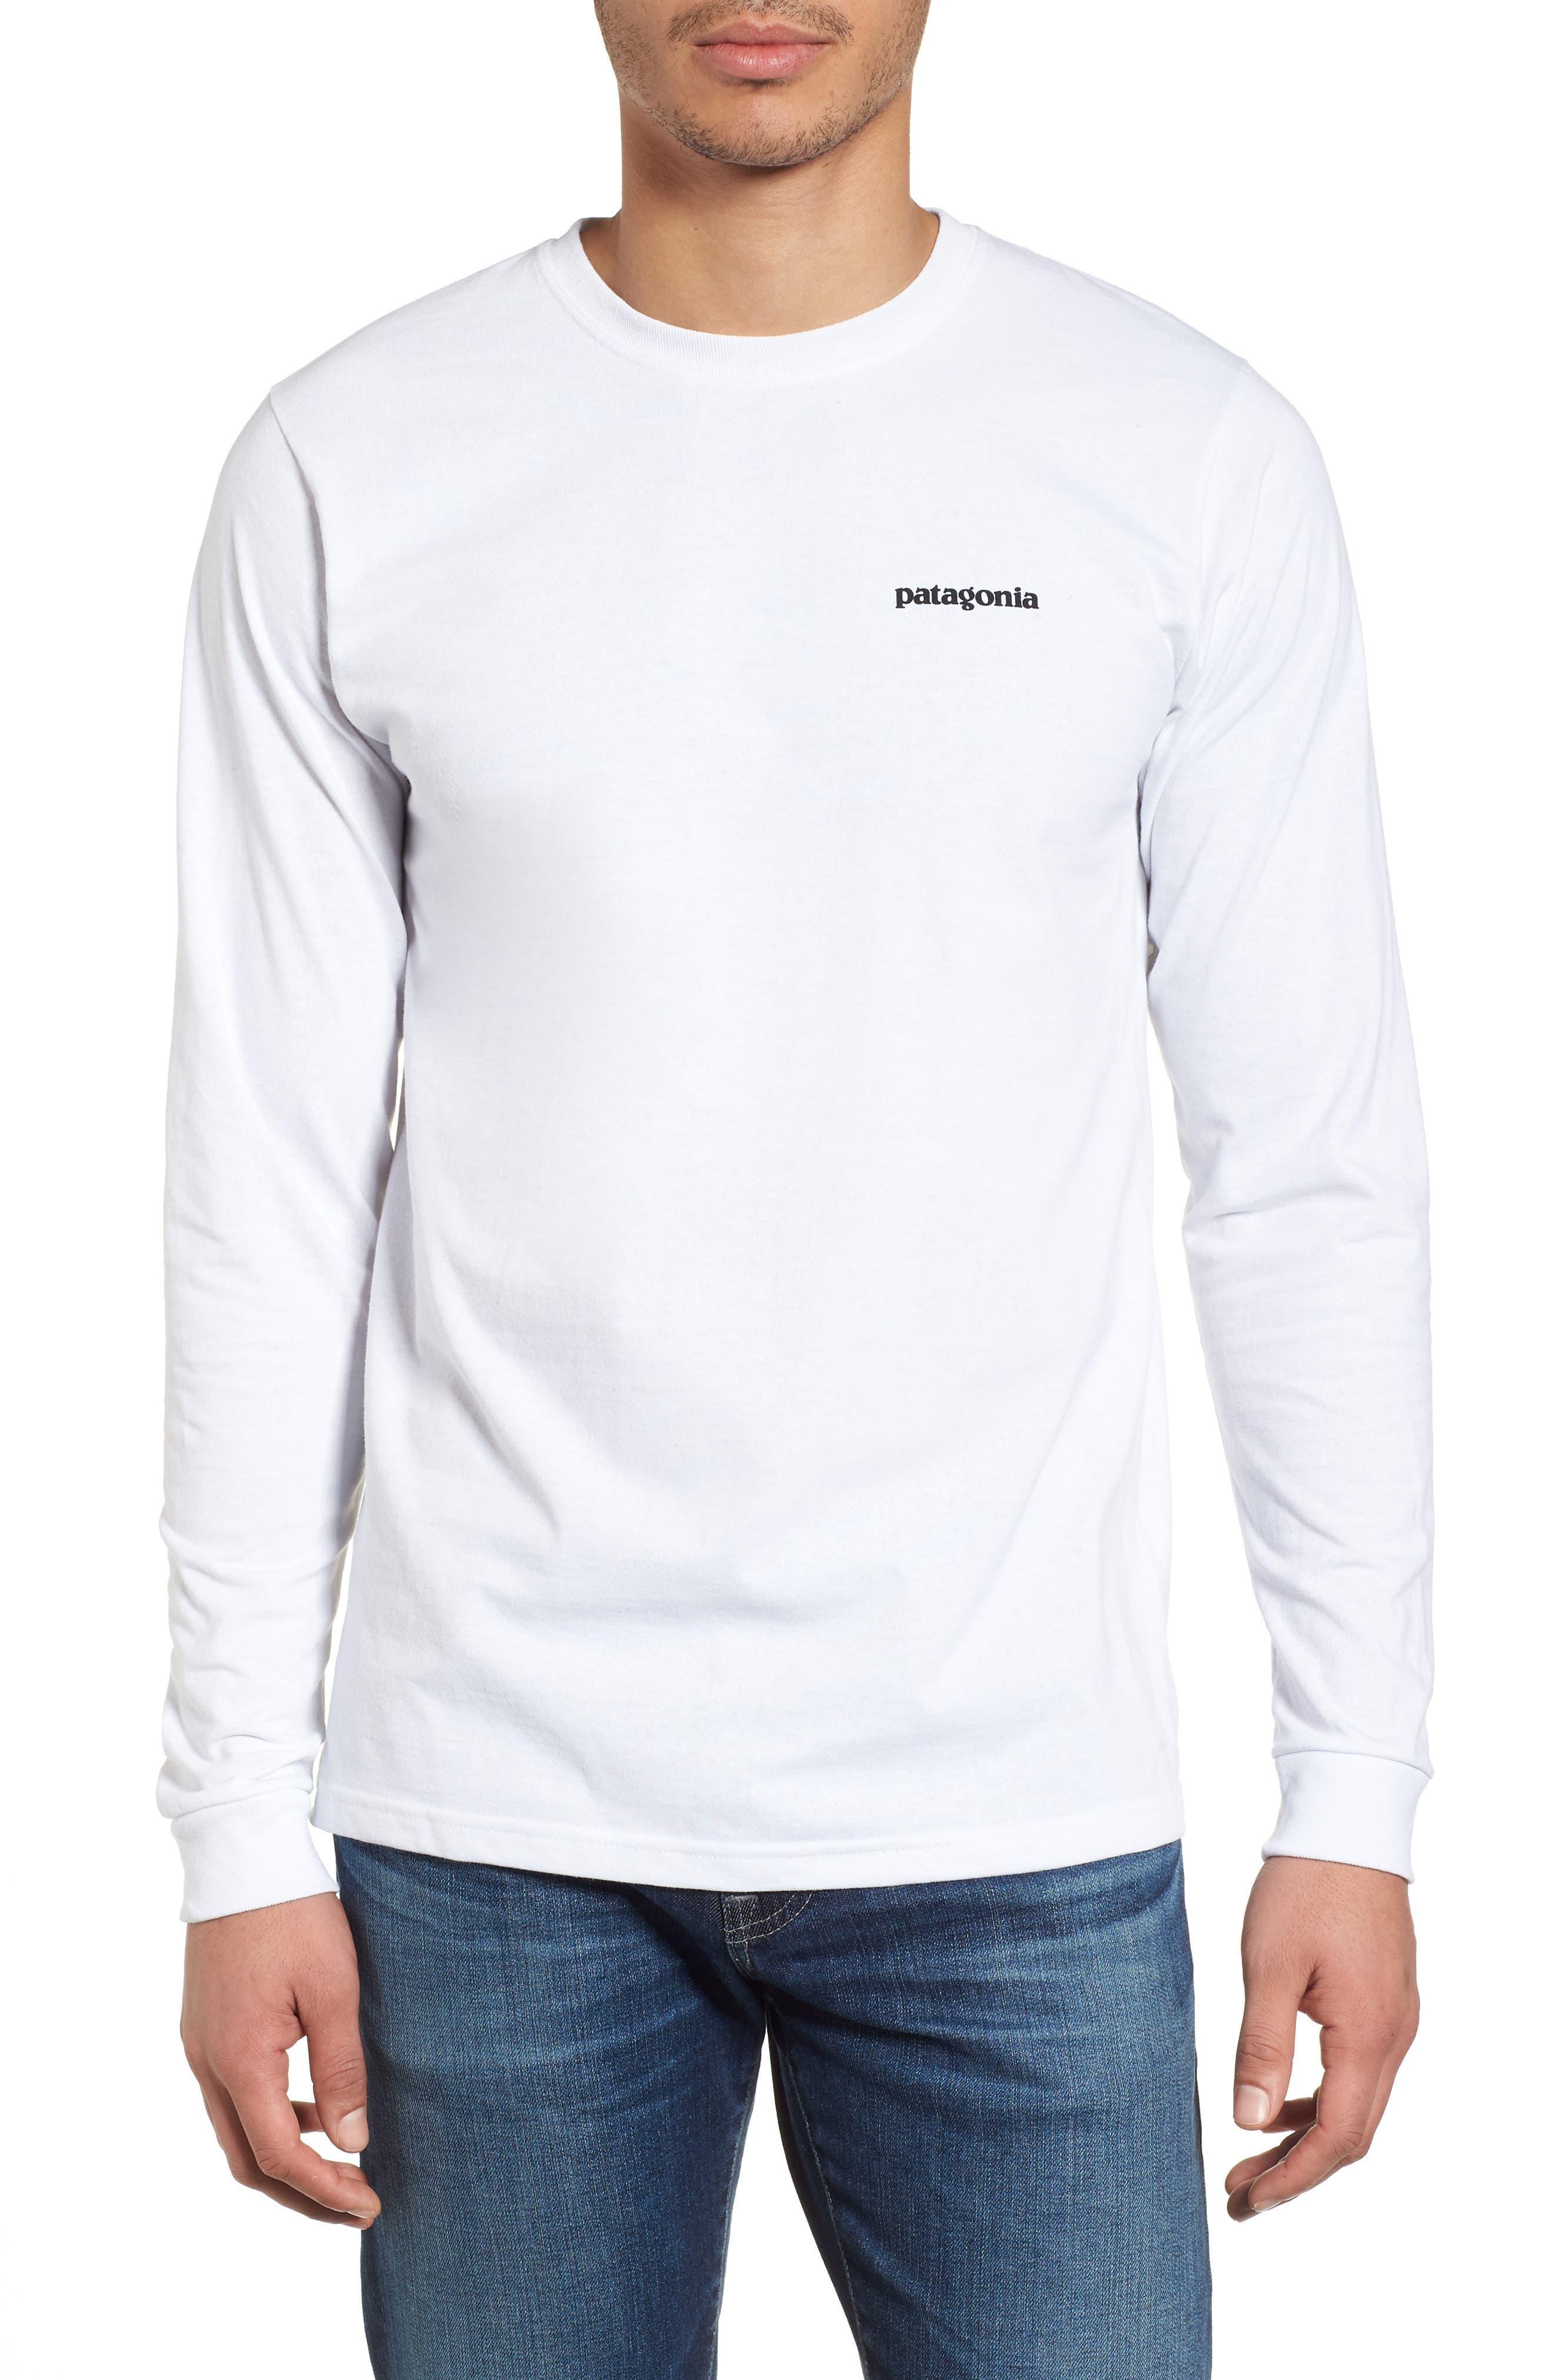 Patagonia Responsibili-Tee Long Sleeve T-Shirt, White